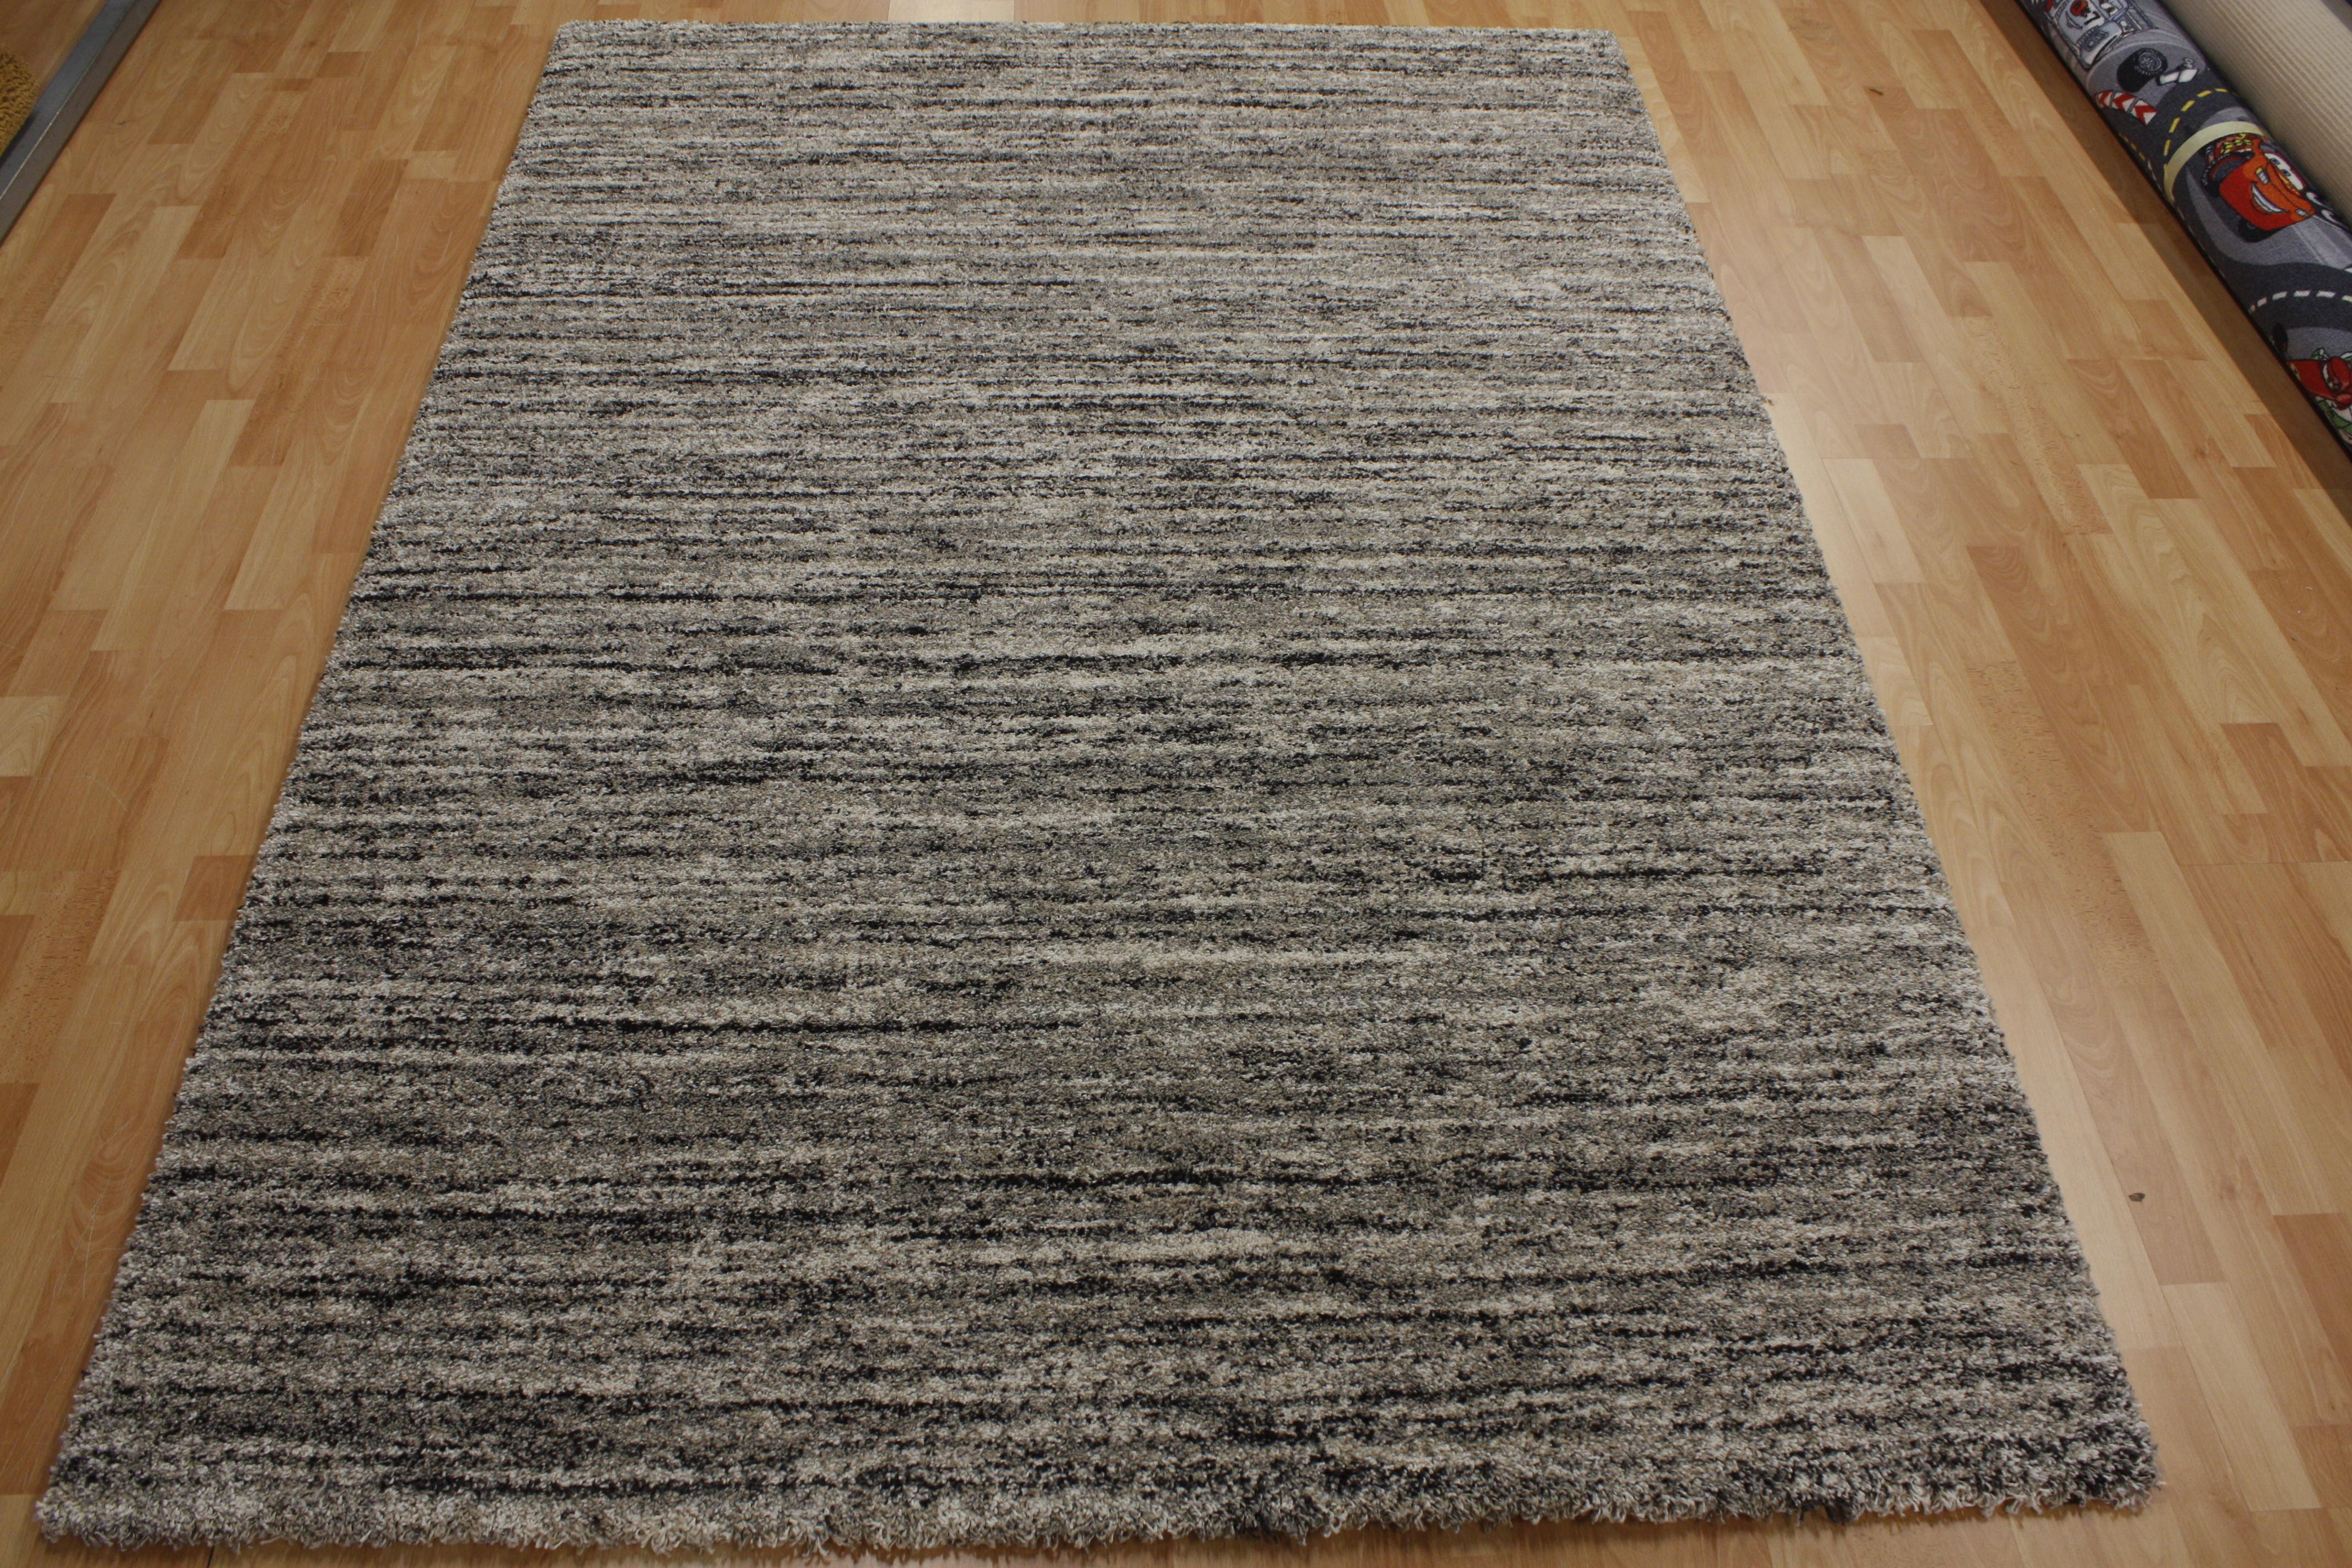 mehari teppich 23067 6848 ragolle 200x290cm streifen grau. Black Bedroom Furniture Sets. Home Design Ideas